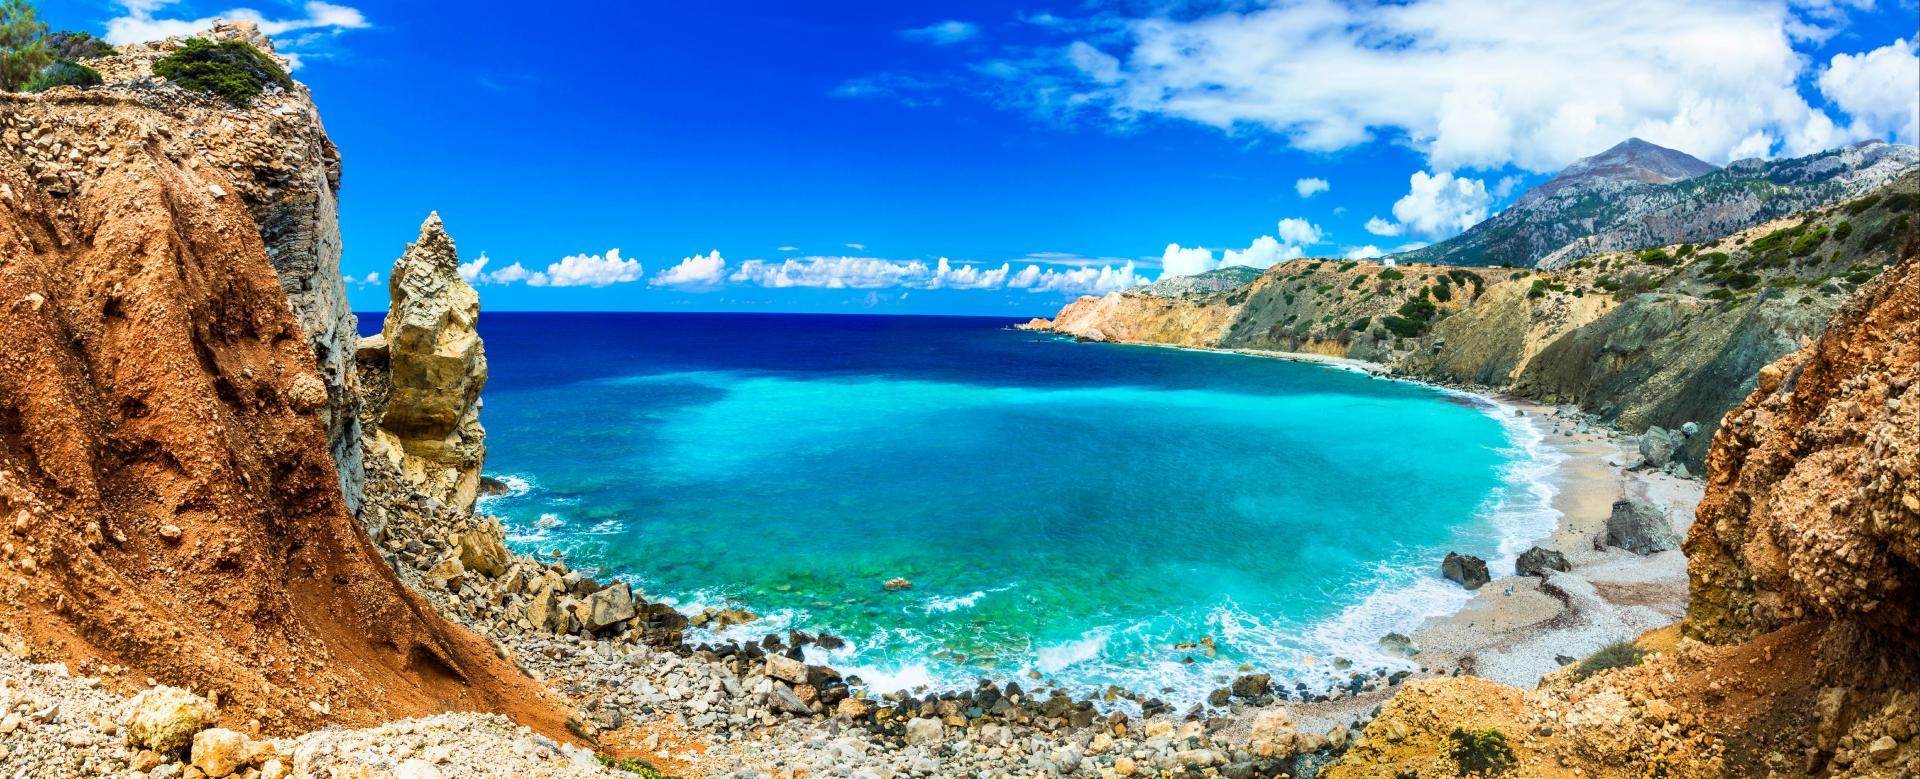 Voyage à pied : Karpathos, rhodes et symi